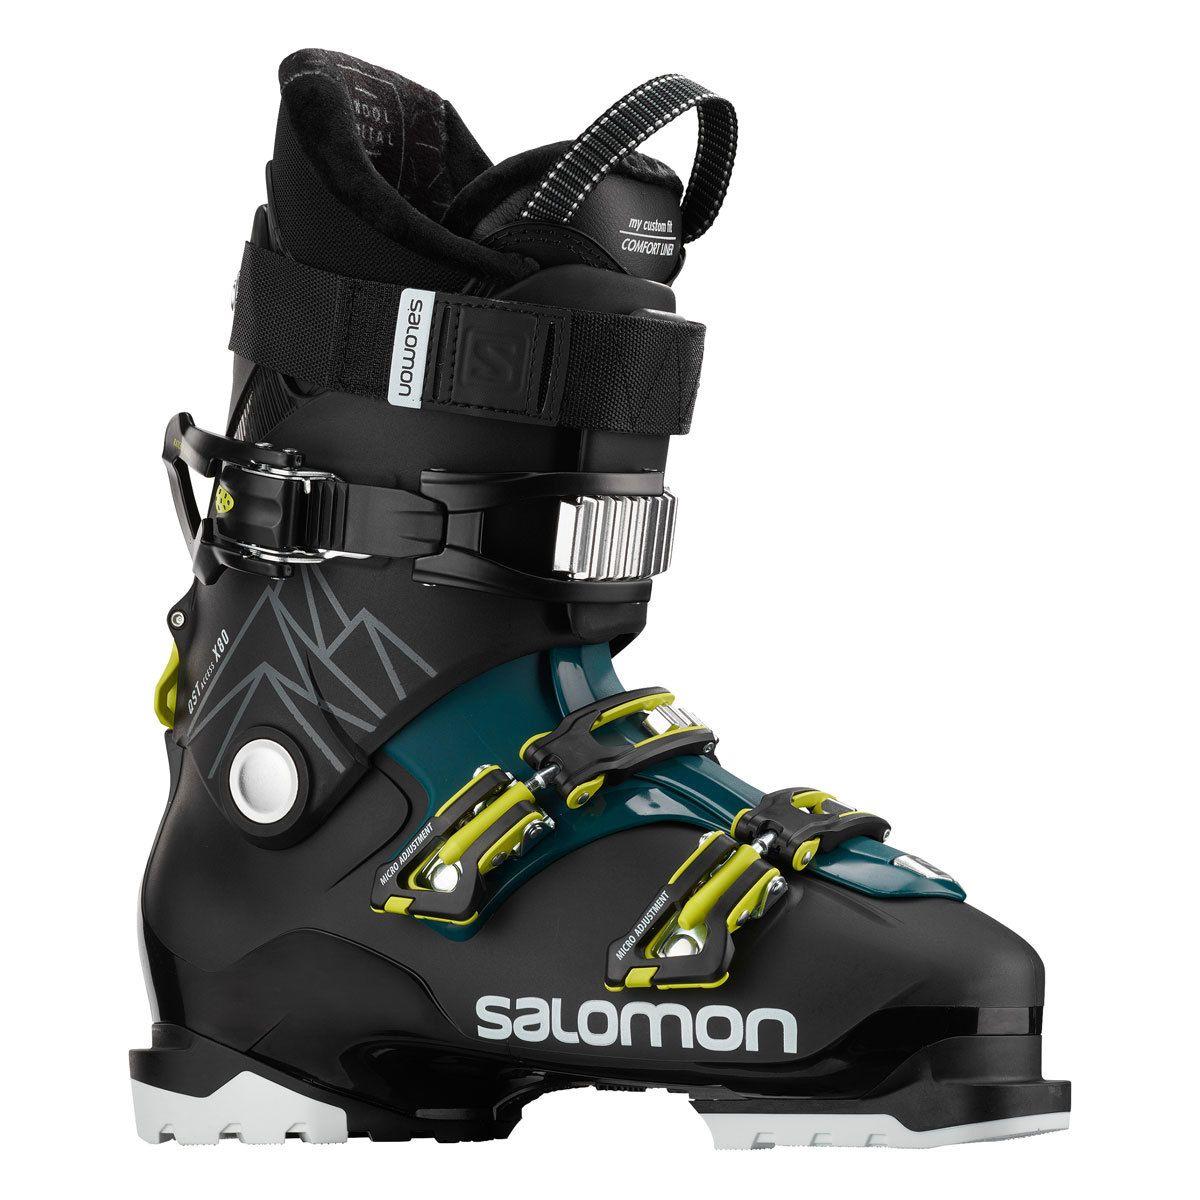 QST Access X80 Bottes de ski alpin pour homme | Ski alpin